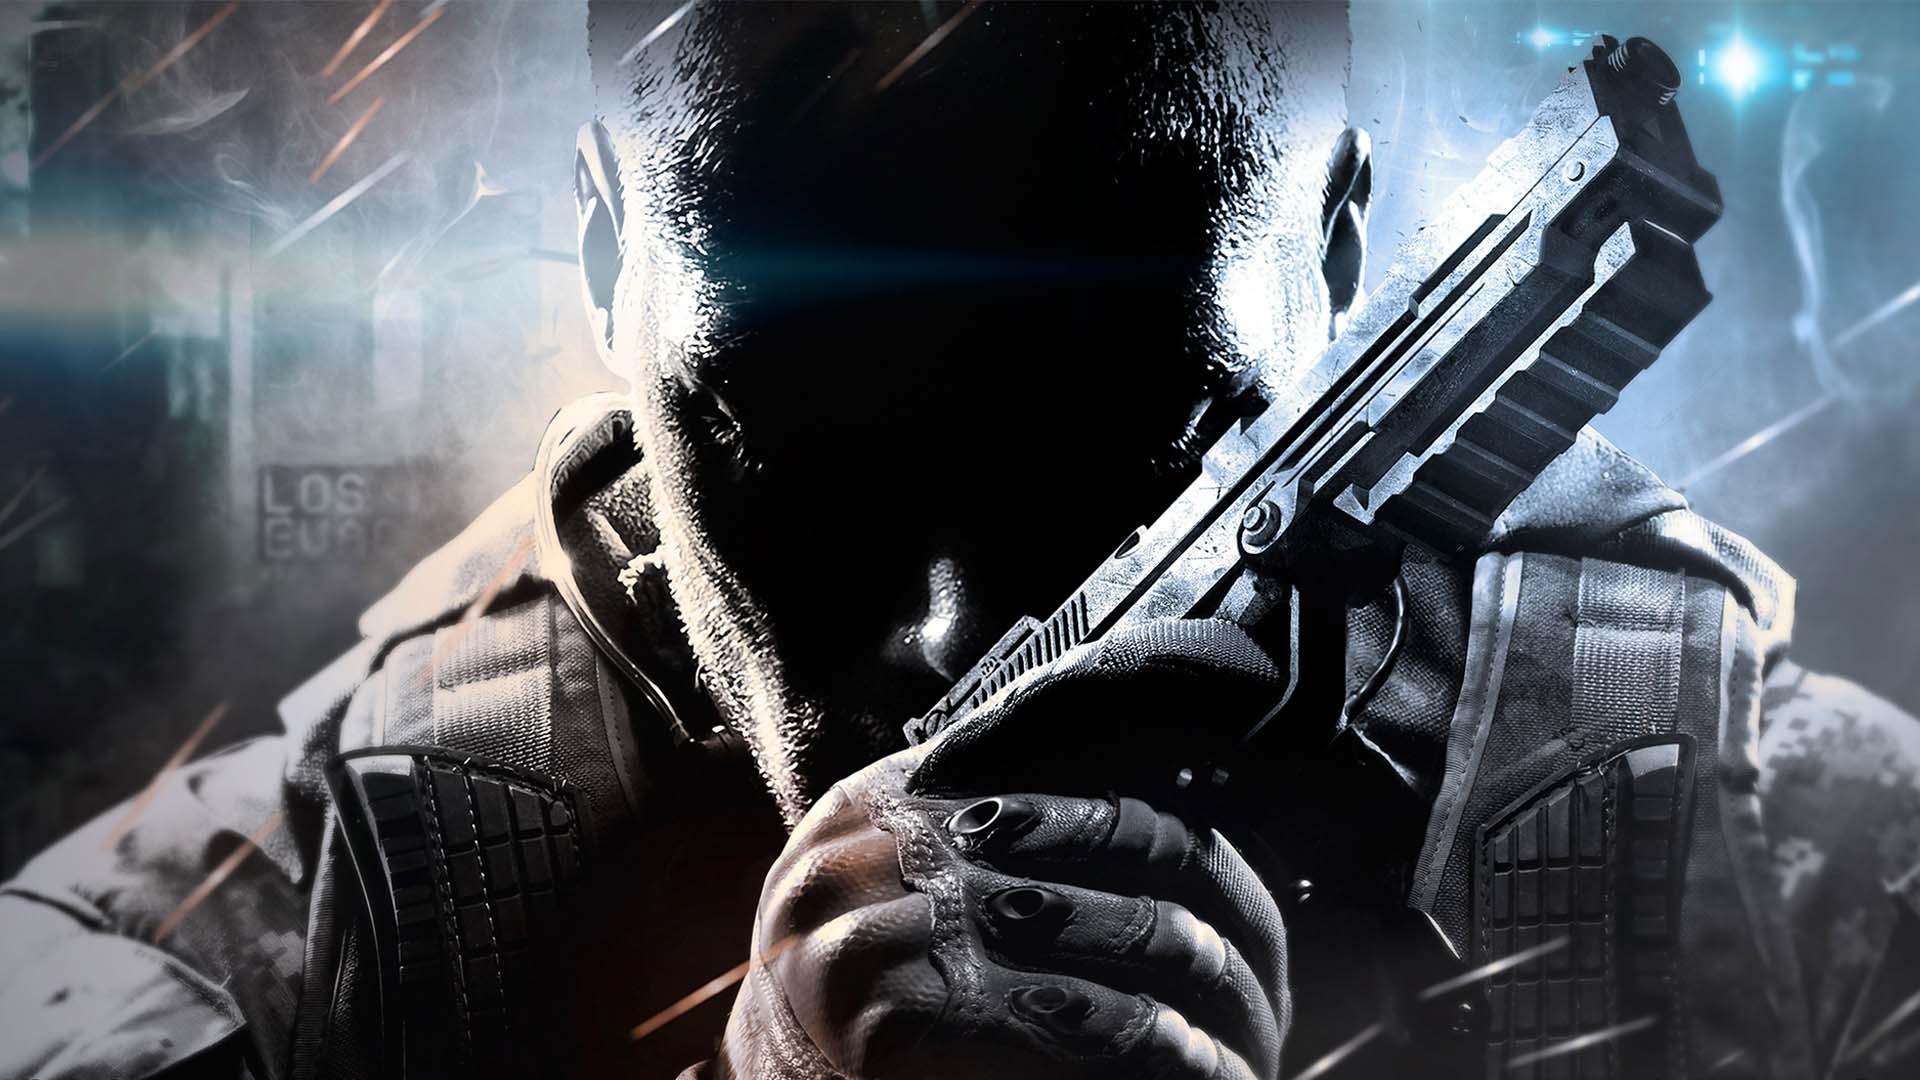 Free Download Call Of Duty Ghost Wallpaper Desktop 7853 Wallpaper